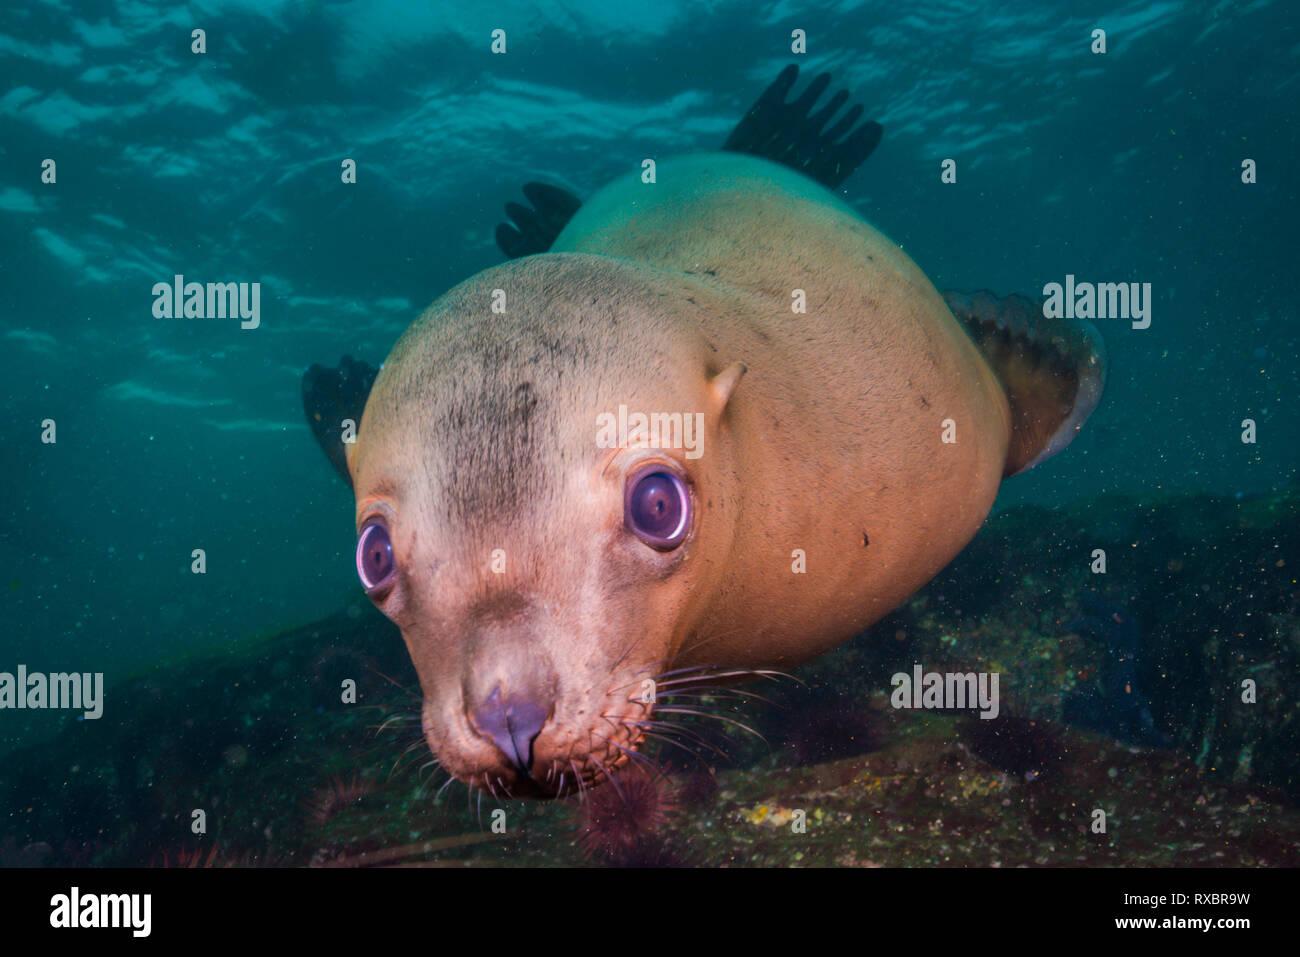 Steller sea lion face, Eumetopias jubatus, Christy Islet, Hornby Island, Striat of Georgia, British Columbia, Canada, near threatened species - Stock Image